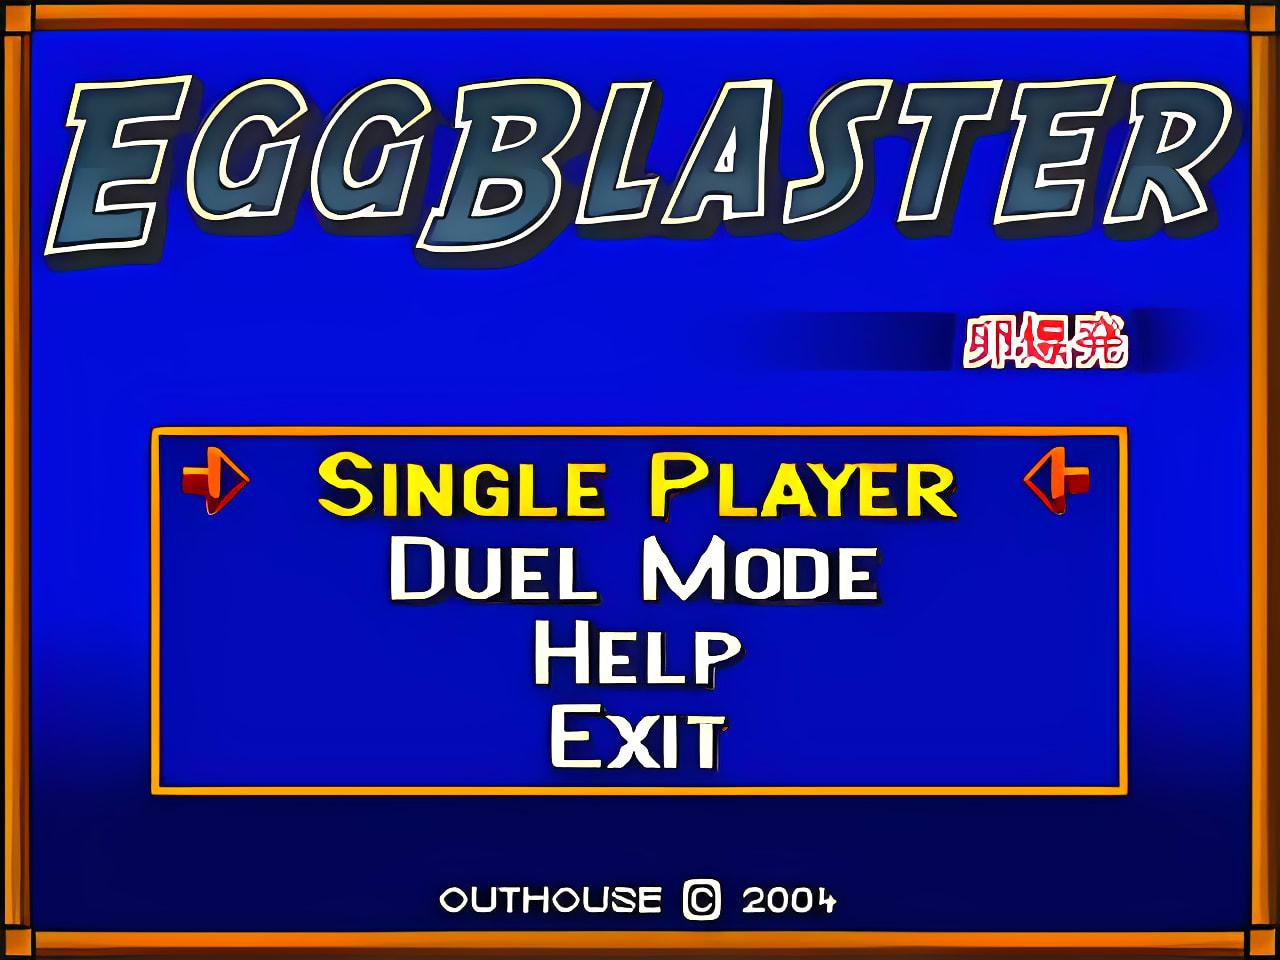 Eggblaster